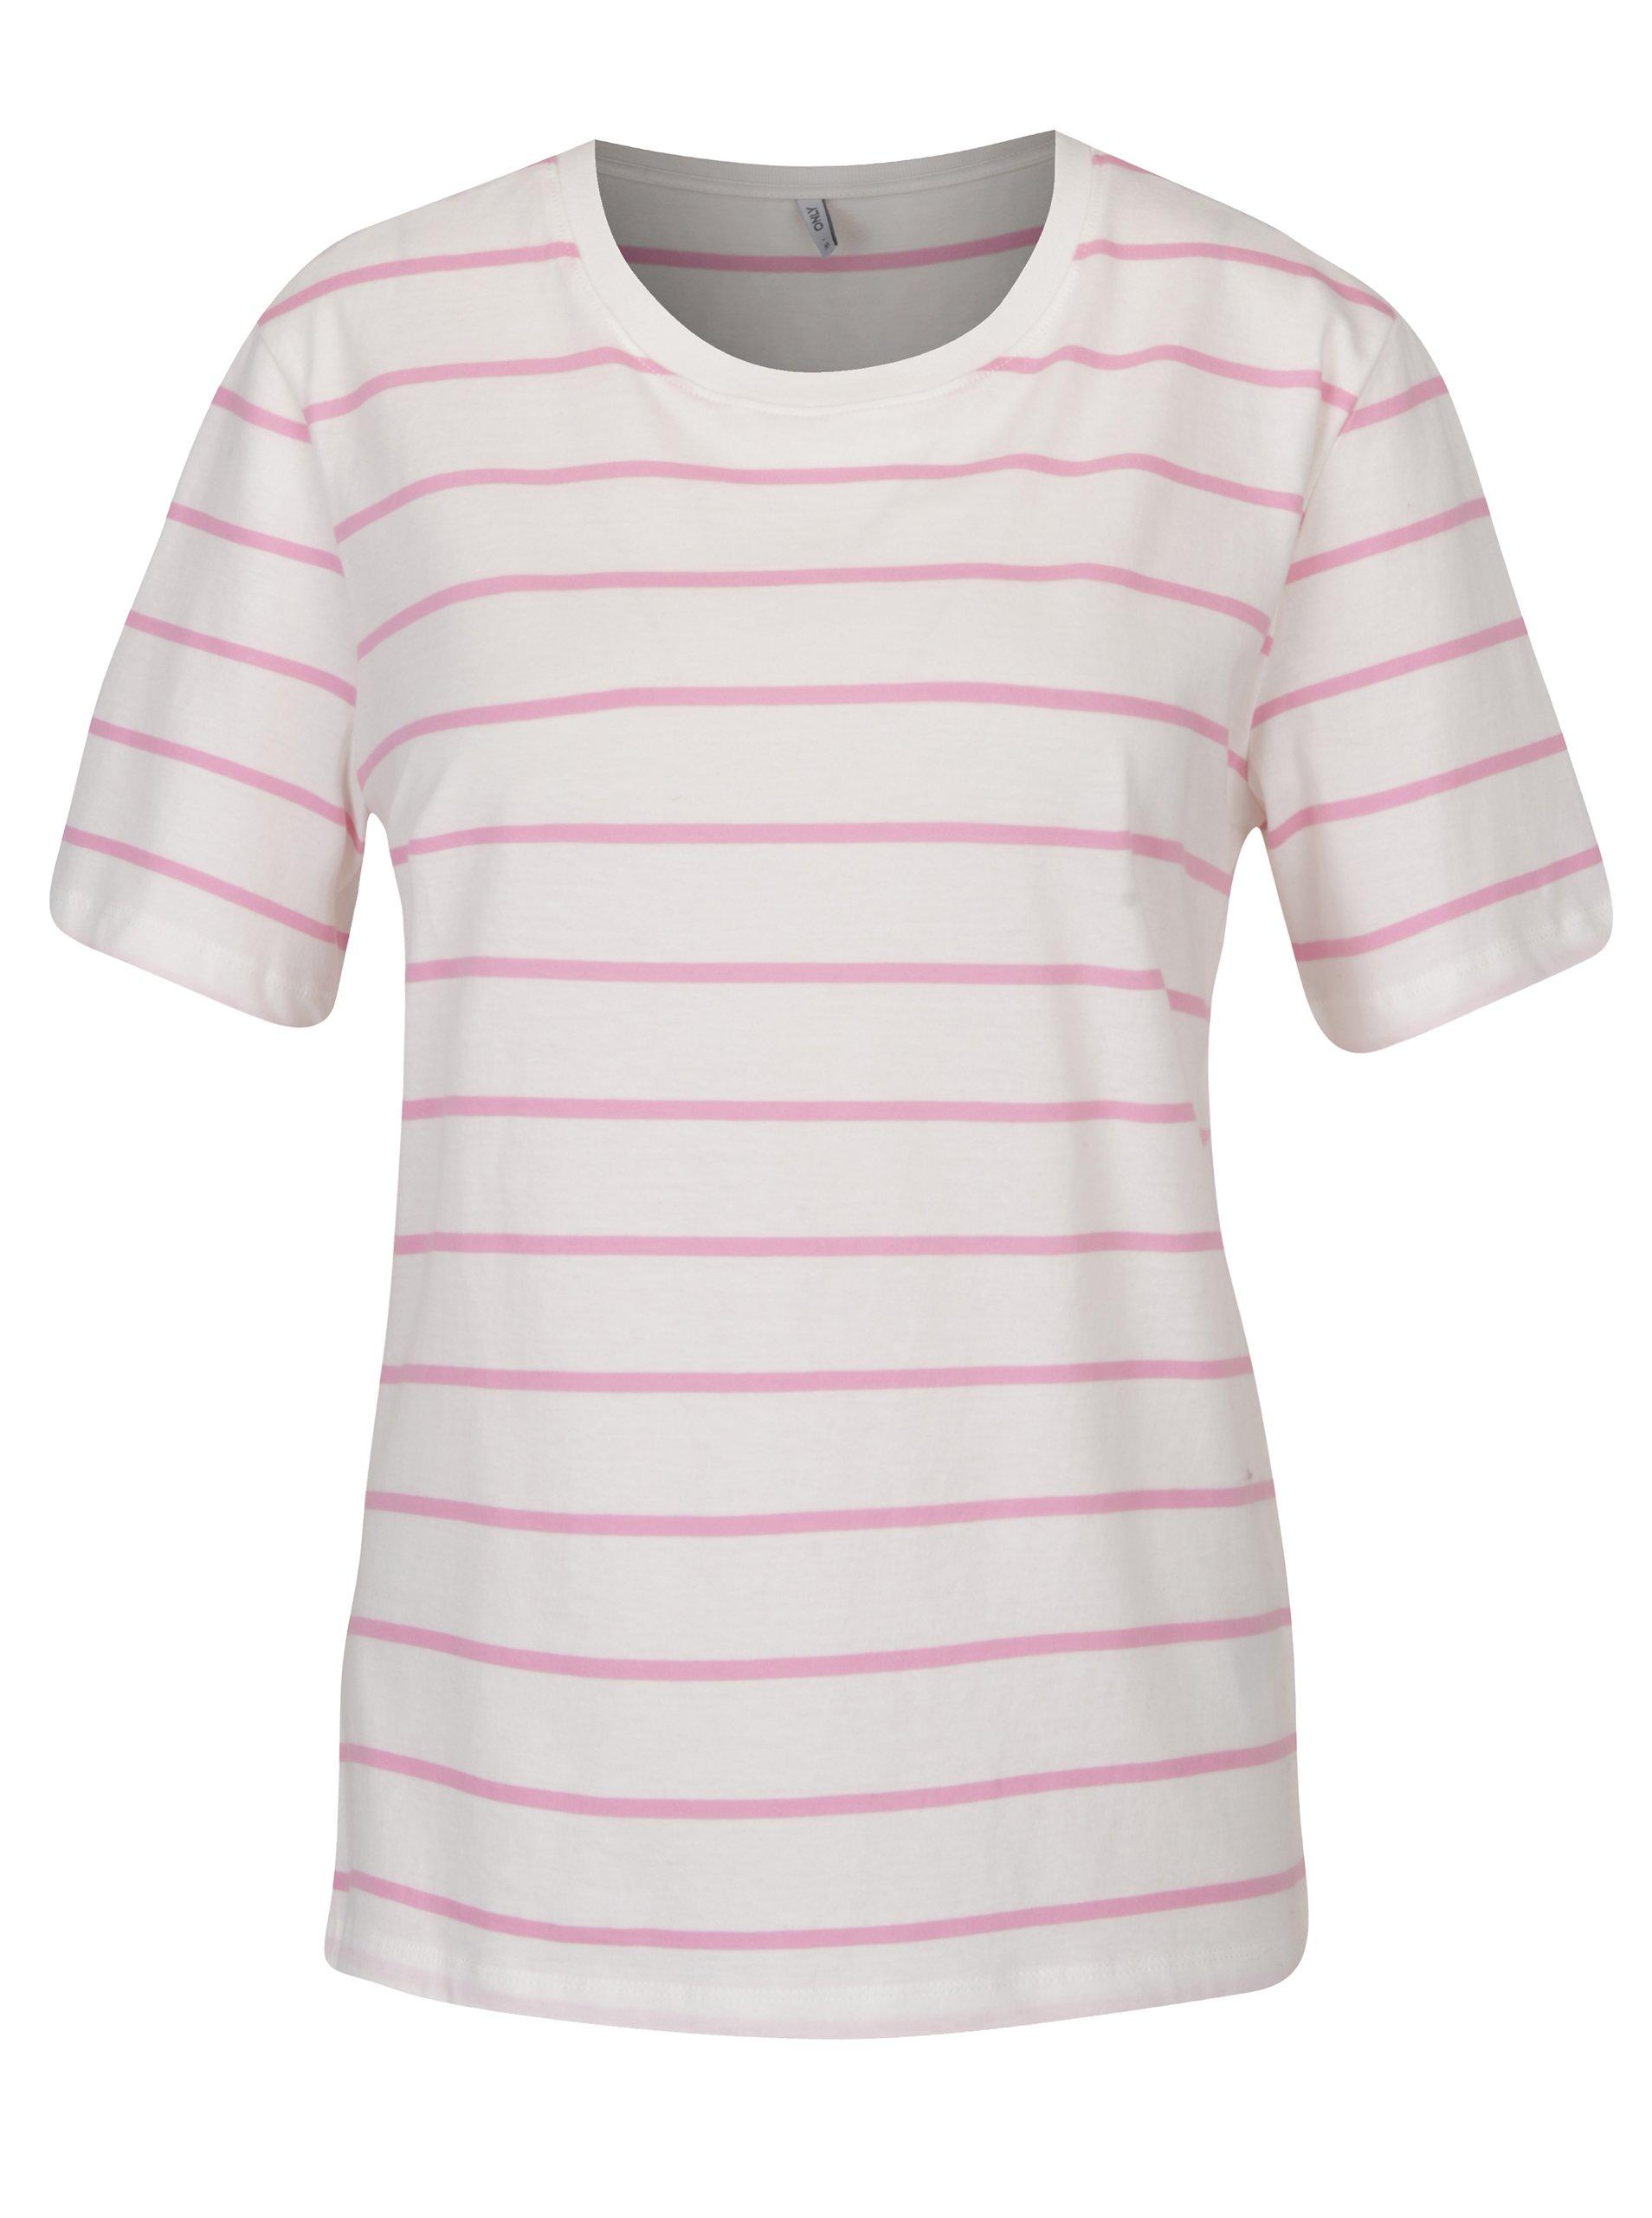 Růžovo-krémové pruhované tričko ONLY Great